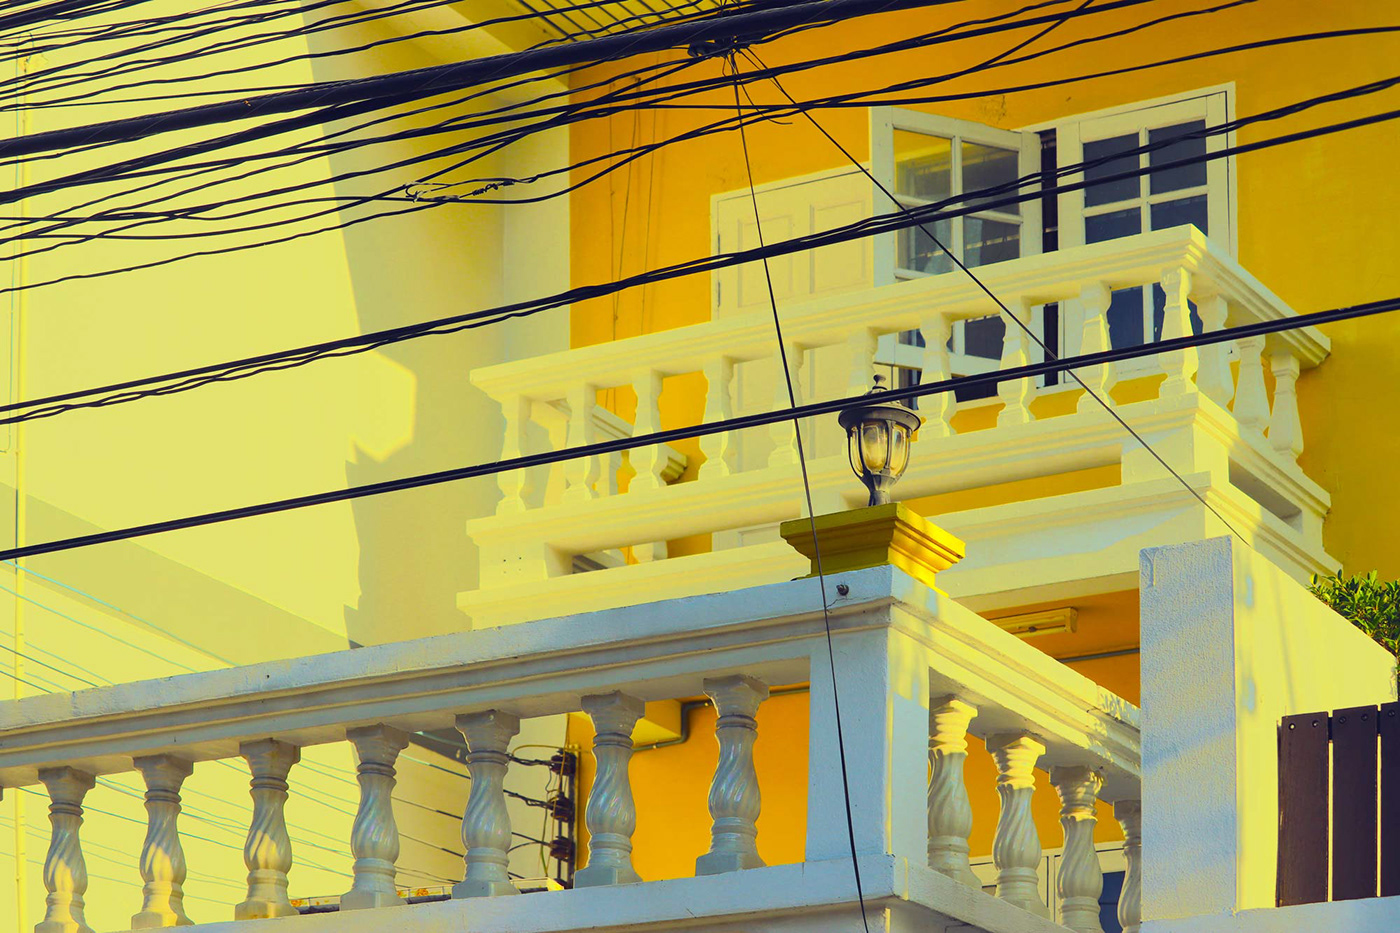 Adobe Photoshop architecture city landscape color colorful Digital Art  research Thailand yaka aiga